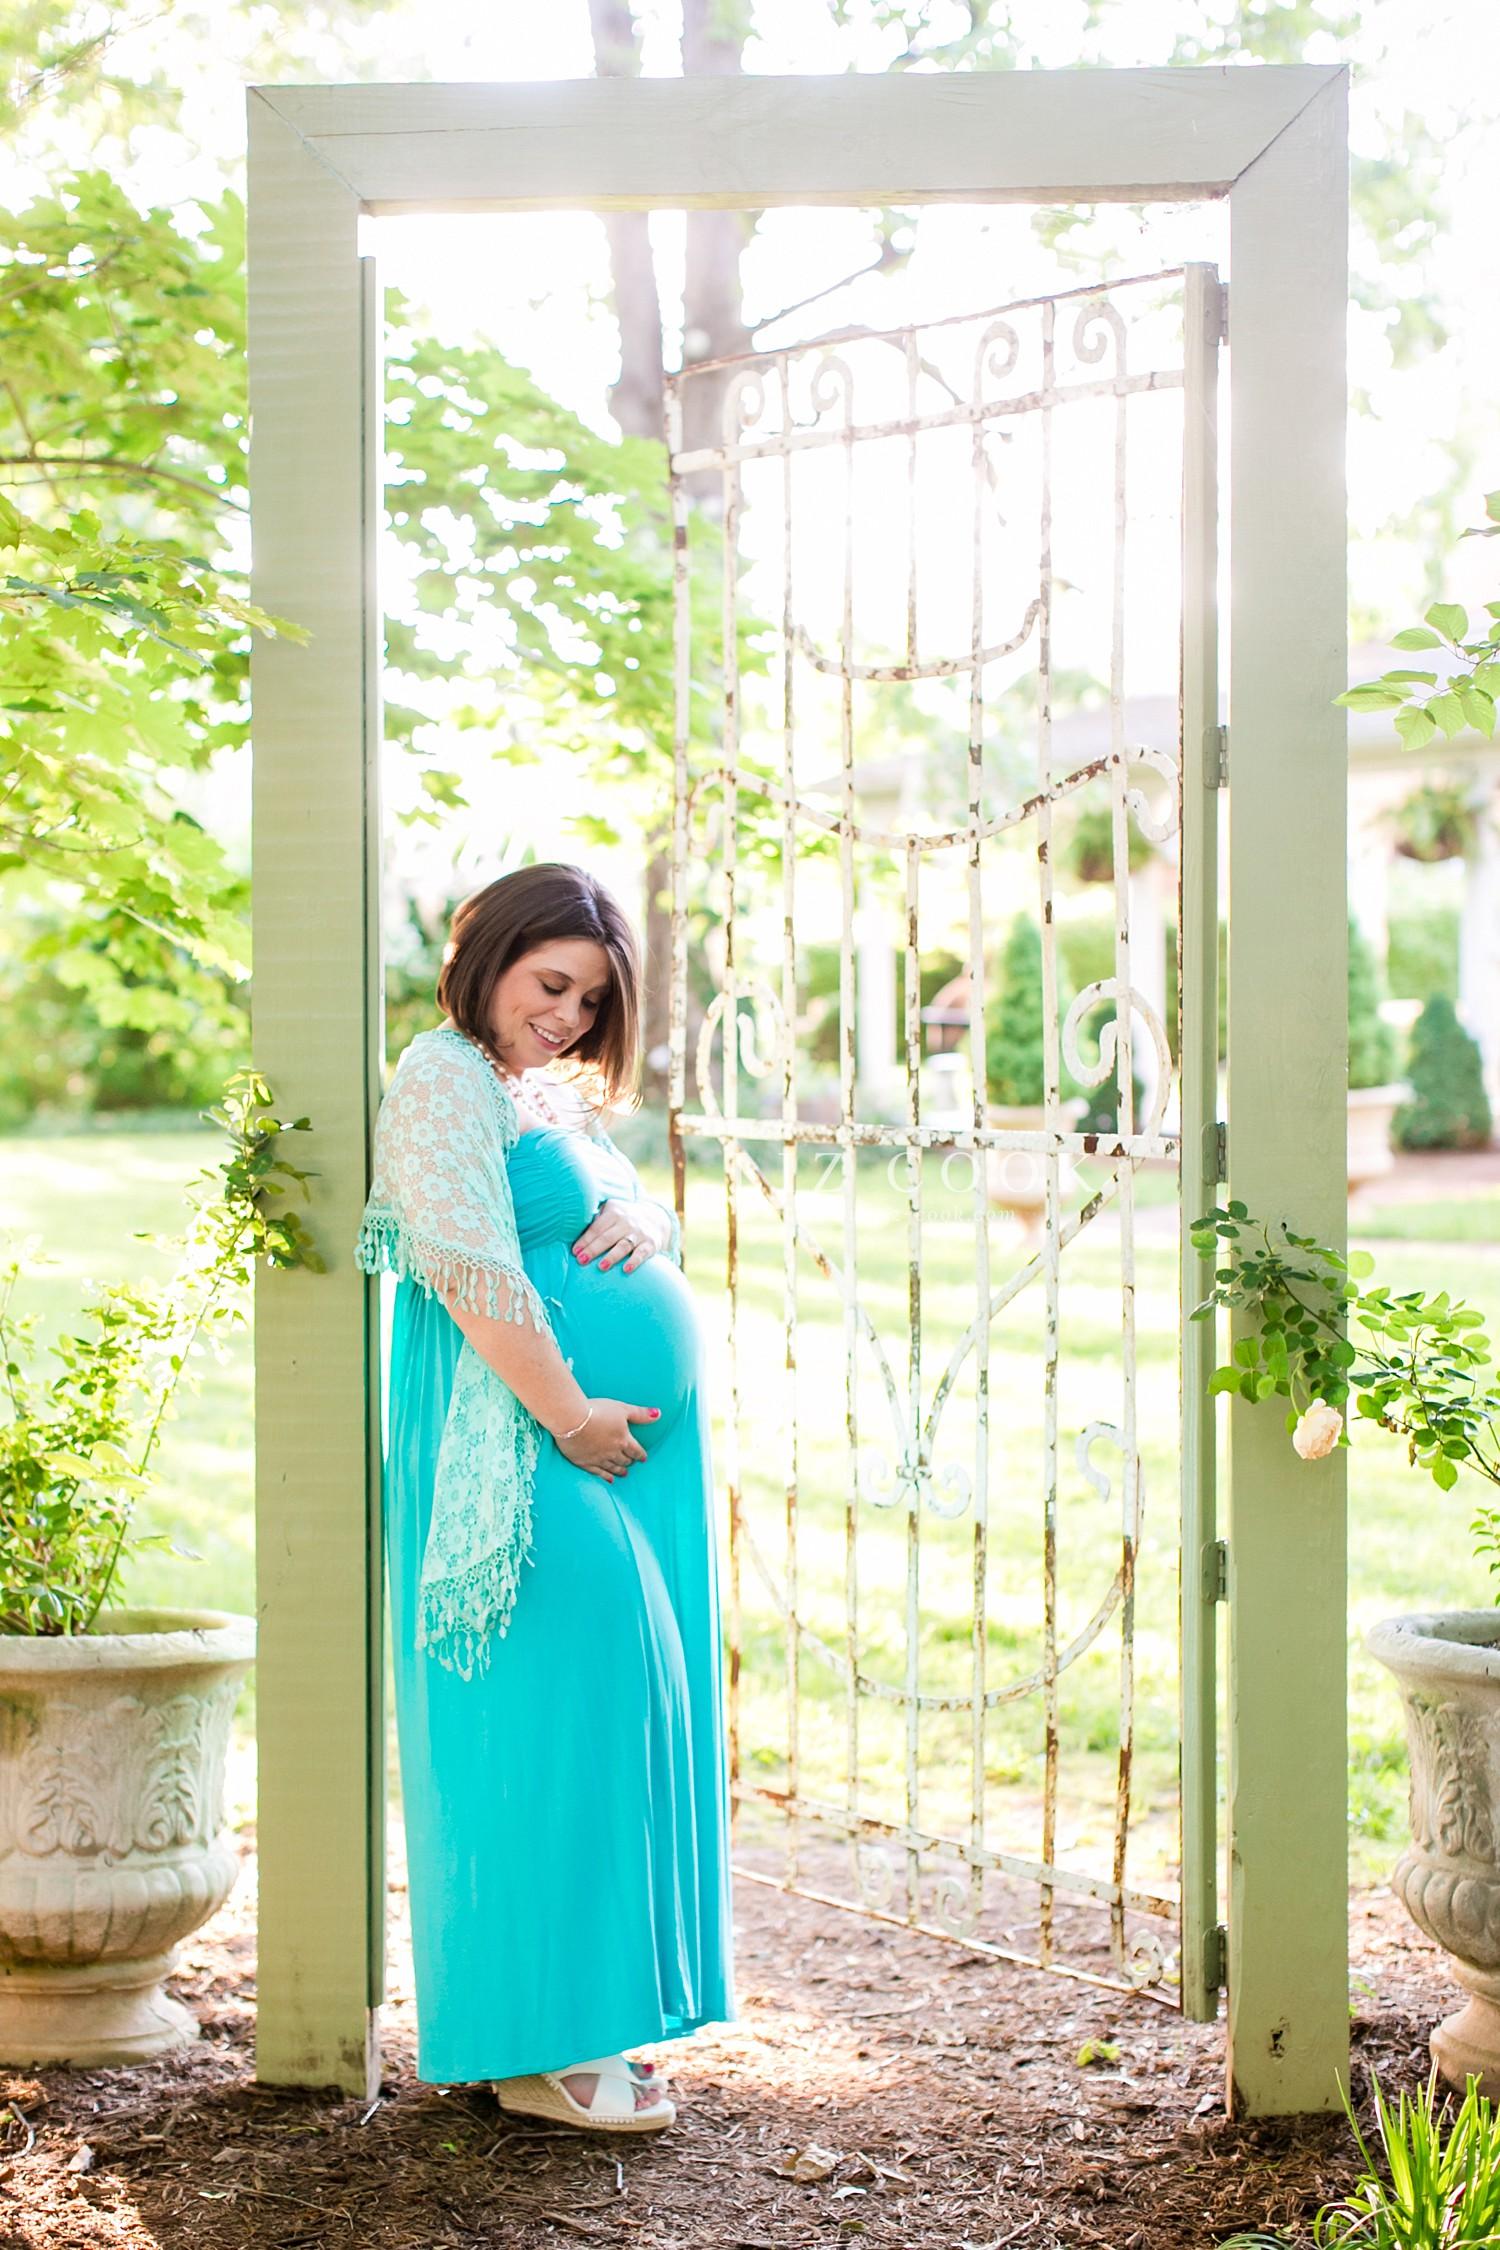 lynchburg-maternity-photographer_0015.jpg